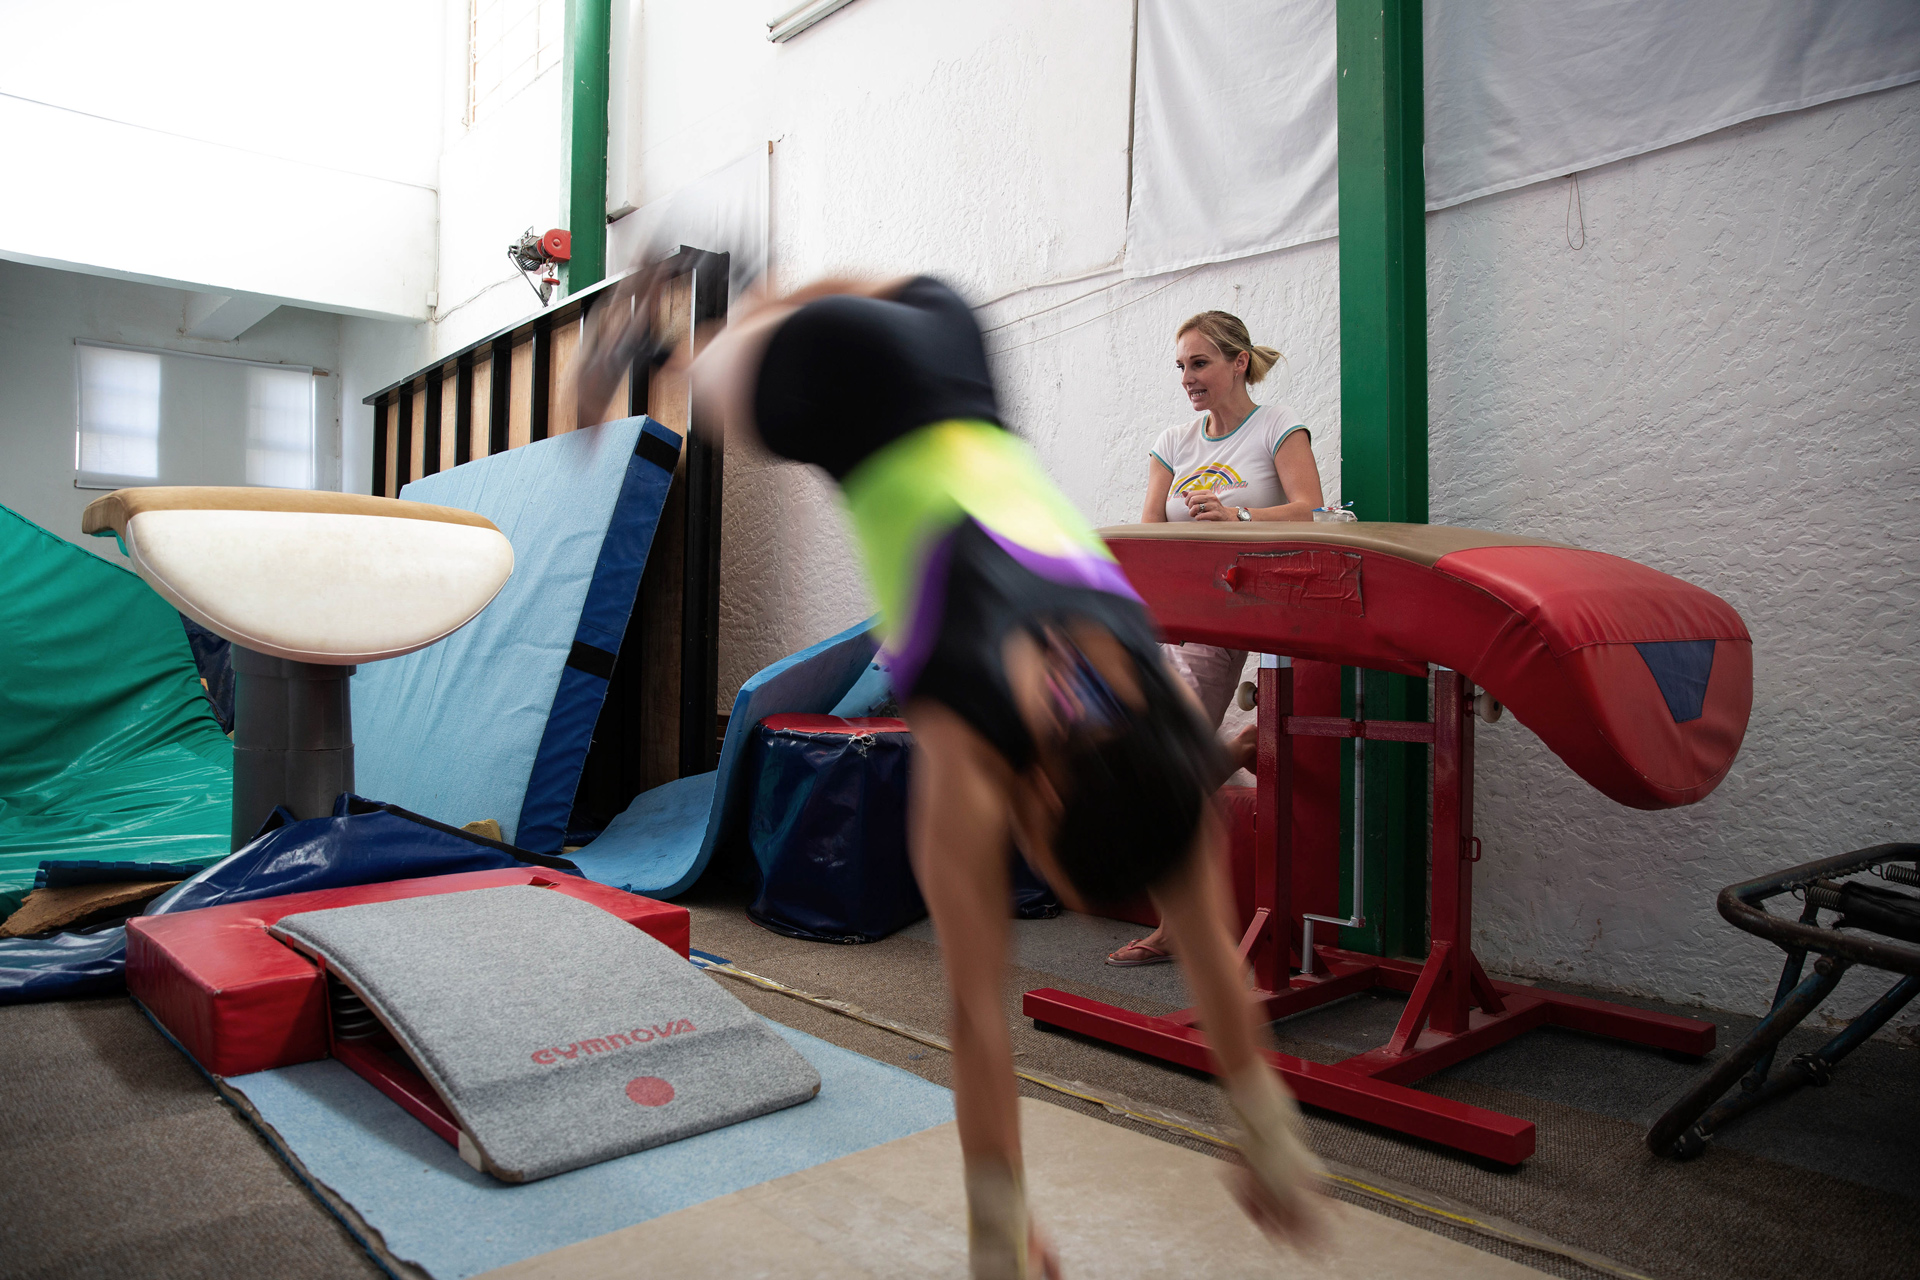 19 November 2019: Coach Ilse Pelser keeping a close eye on Caitlin Rooskrantz at the gymnastics centre where she trains.